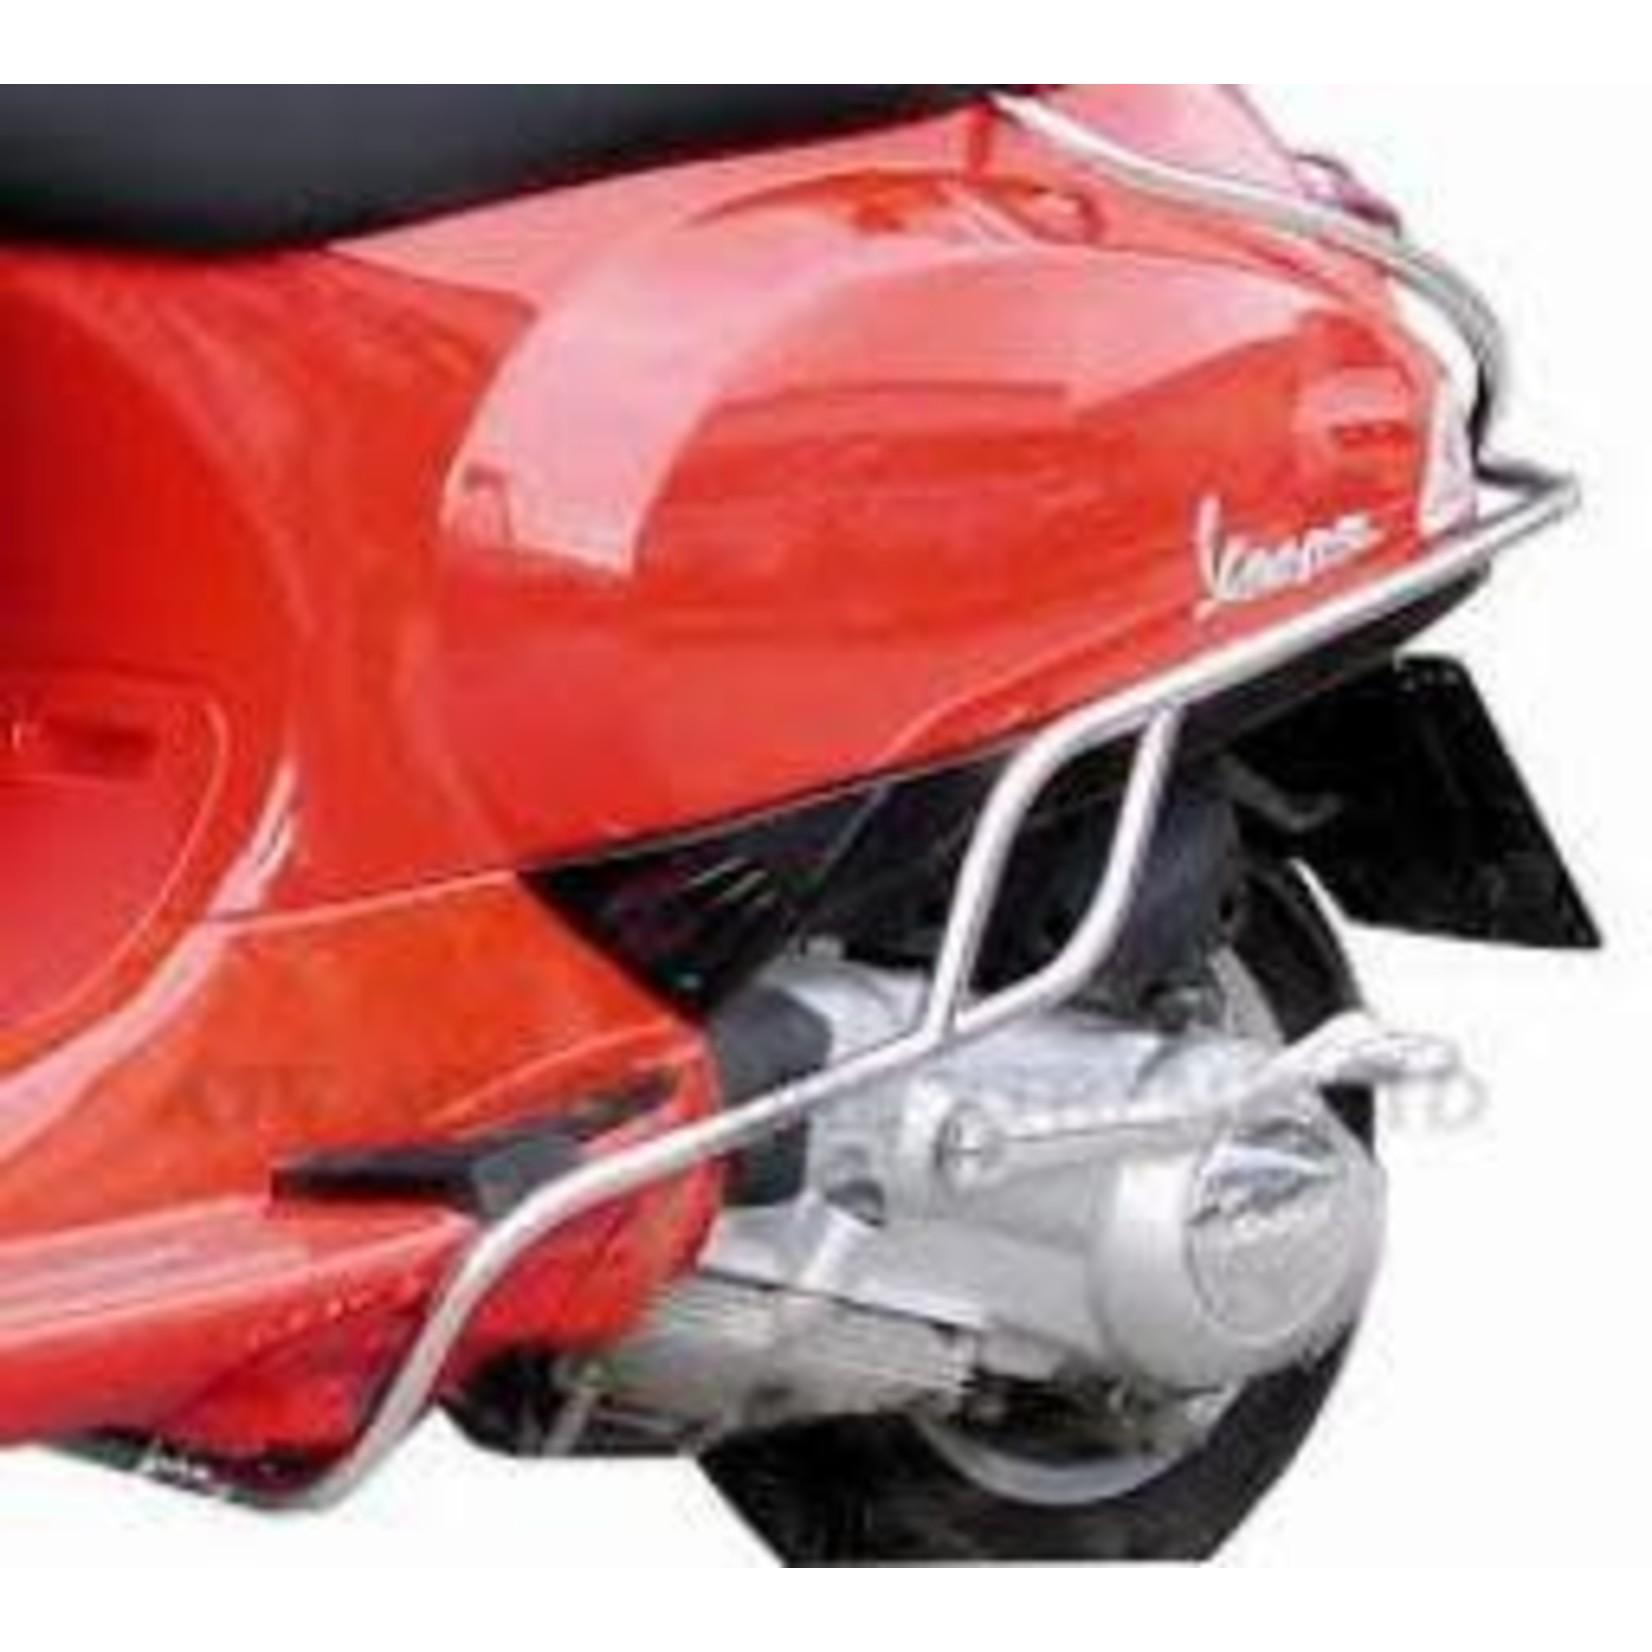 Accessories Protector, Vespa S/LX/LXV Rear Side Cowl